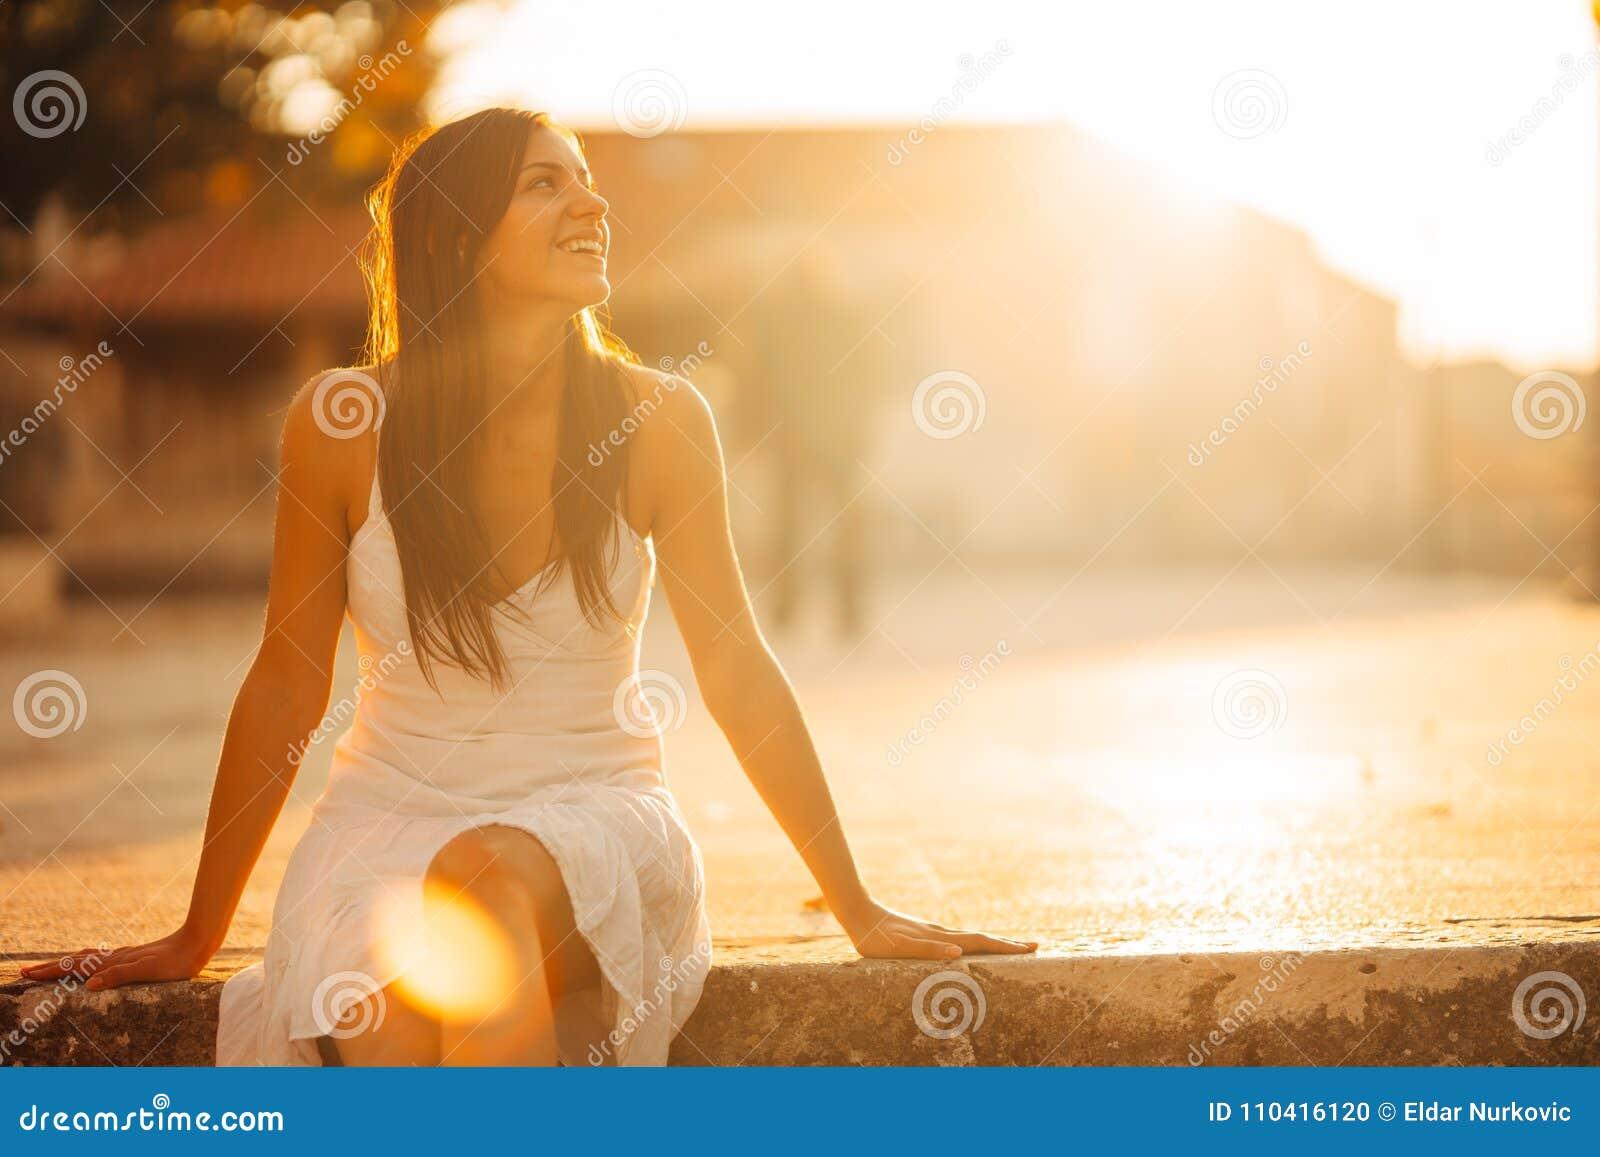 Carefree woman enjoying in nature, beautiful red sunset sunshine. Finding inner peace. Spiritual healing lifestyle. Enjoying peace